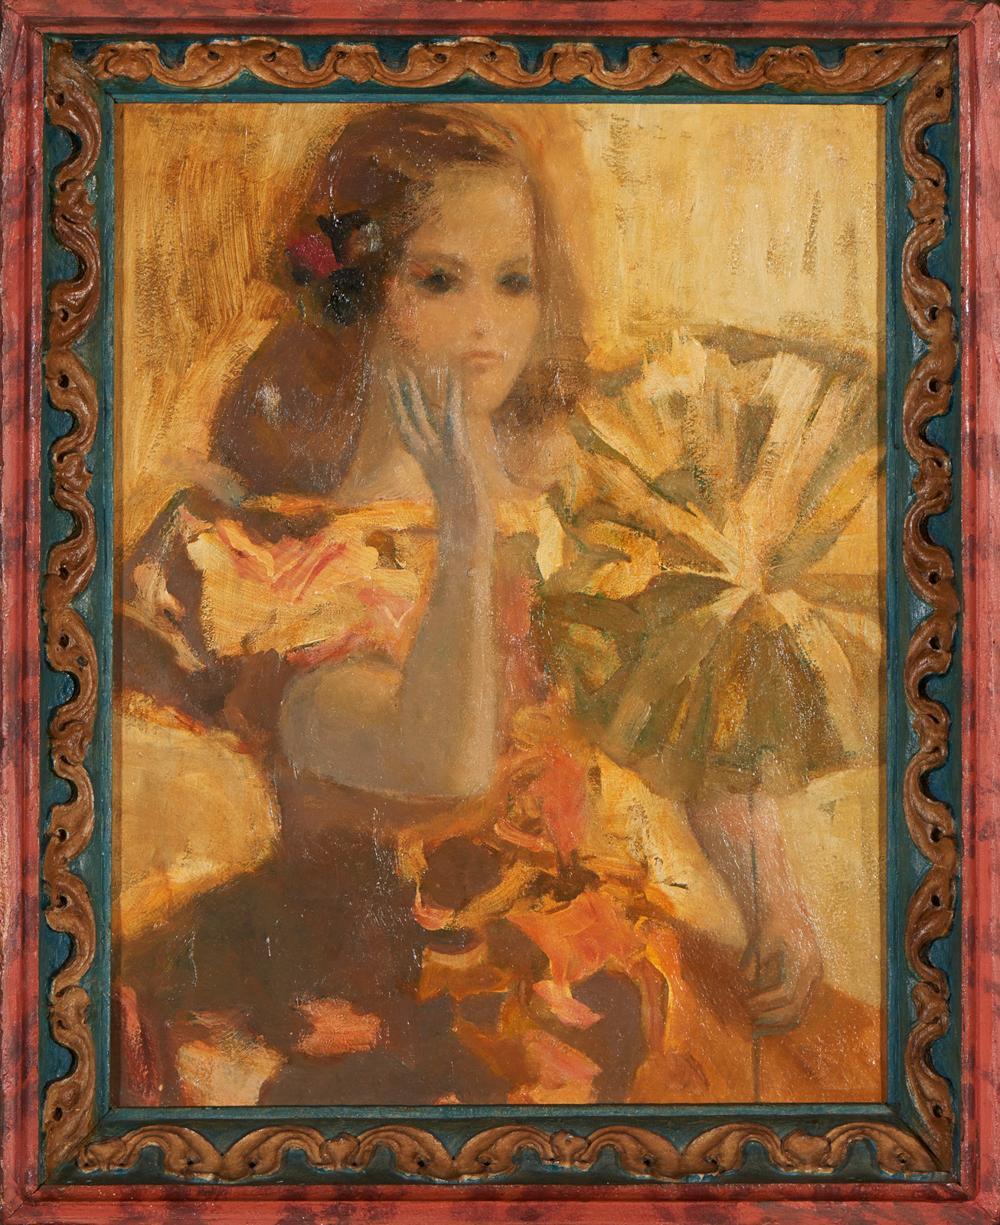 JÚLIO RESENDE, Óleo s/ contraplacado, 65x50 cm.